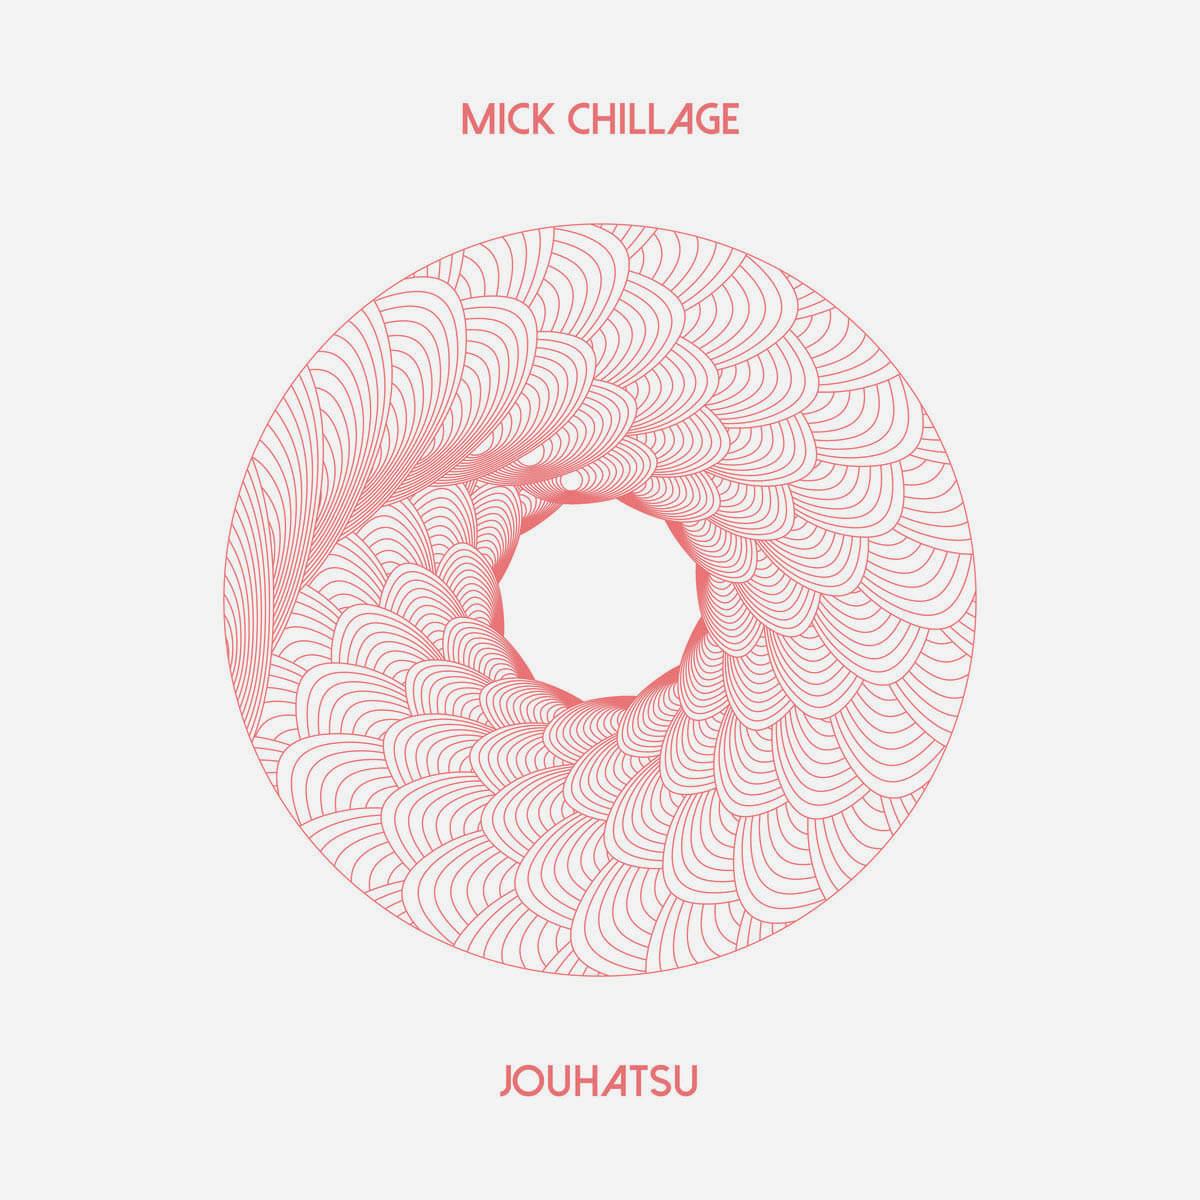 mick chillage jouhatsu CD